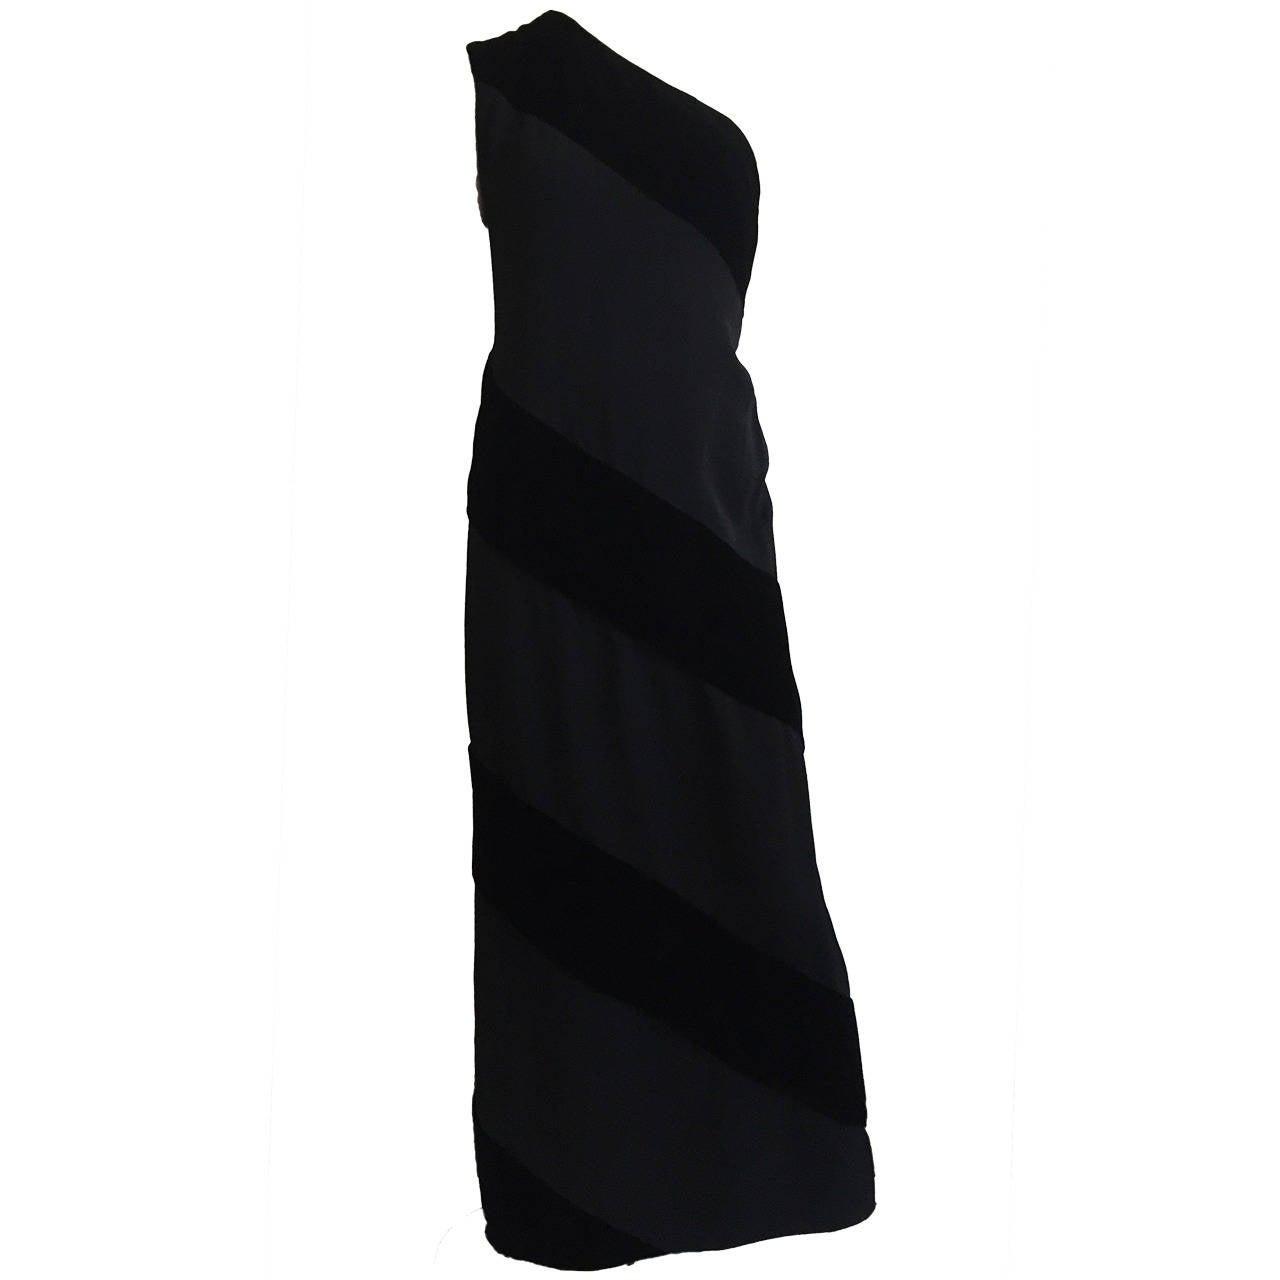 Carolyne Roehm Black Velvet Gown Size 8.